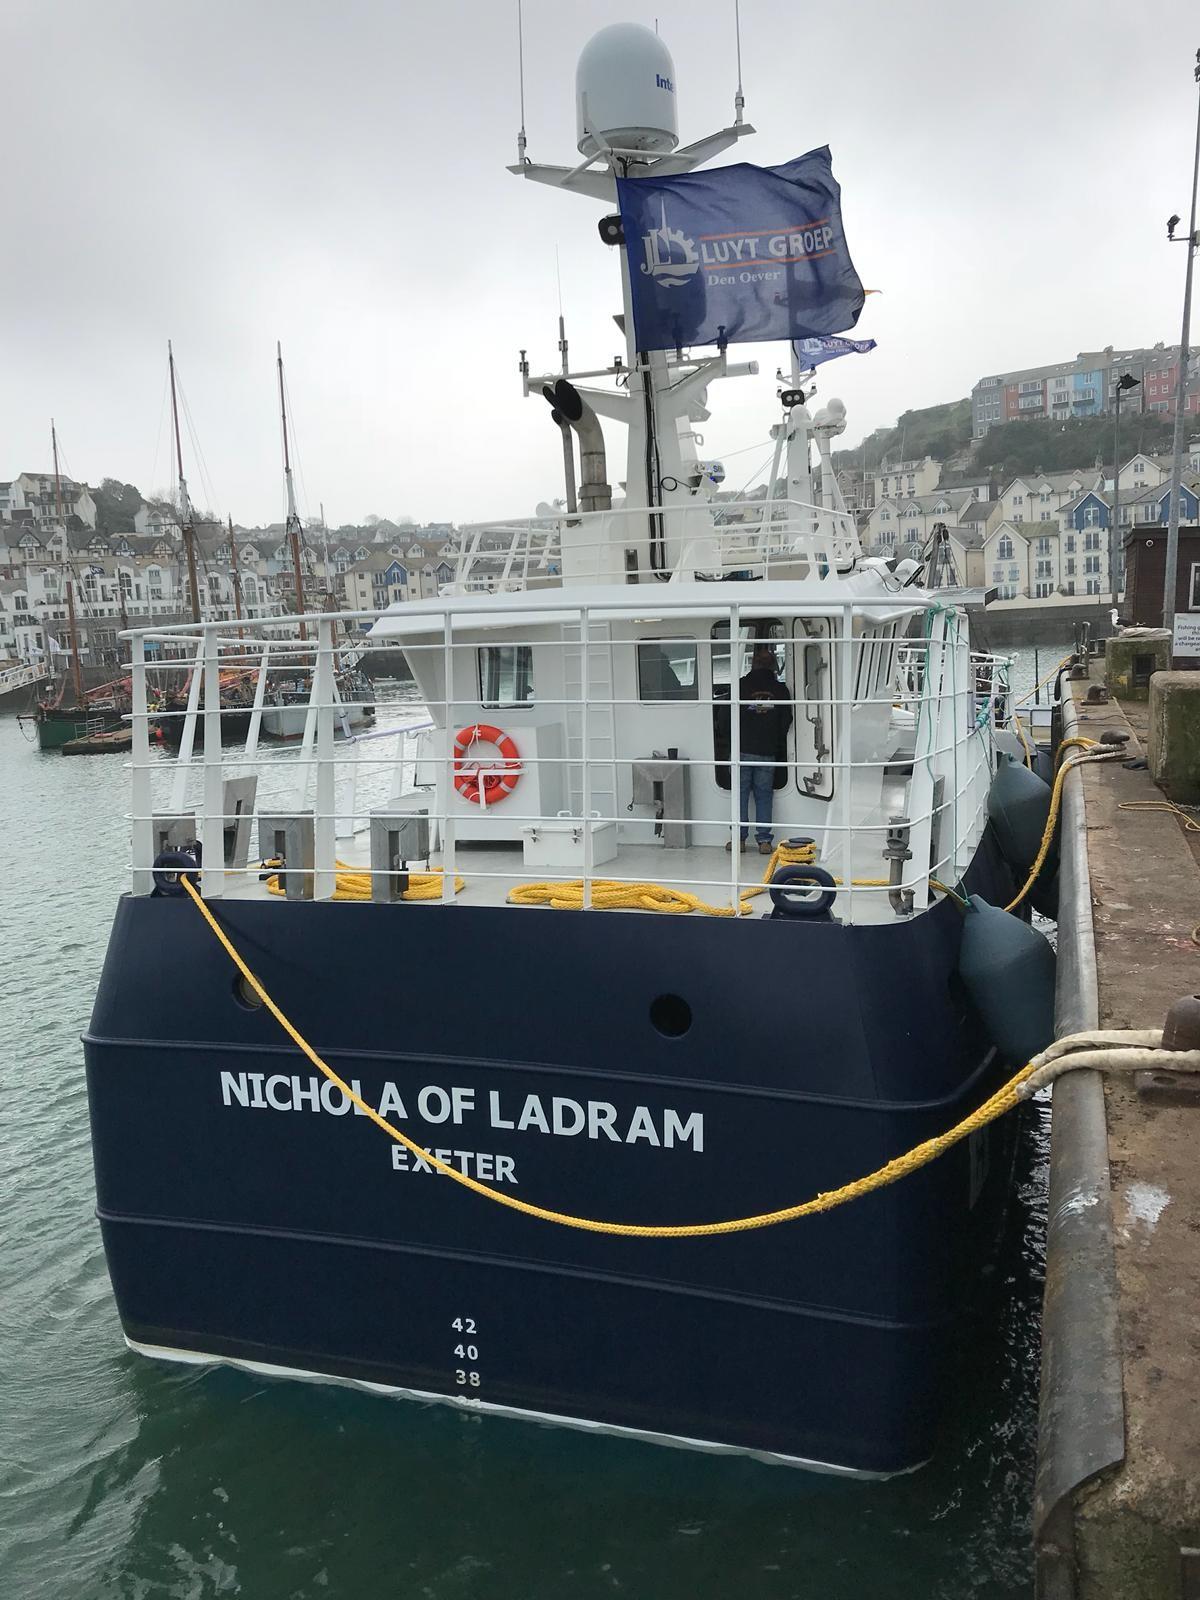 Nicola of ladram brixham 6.jpg